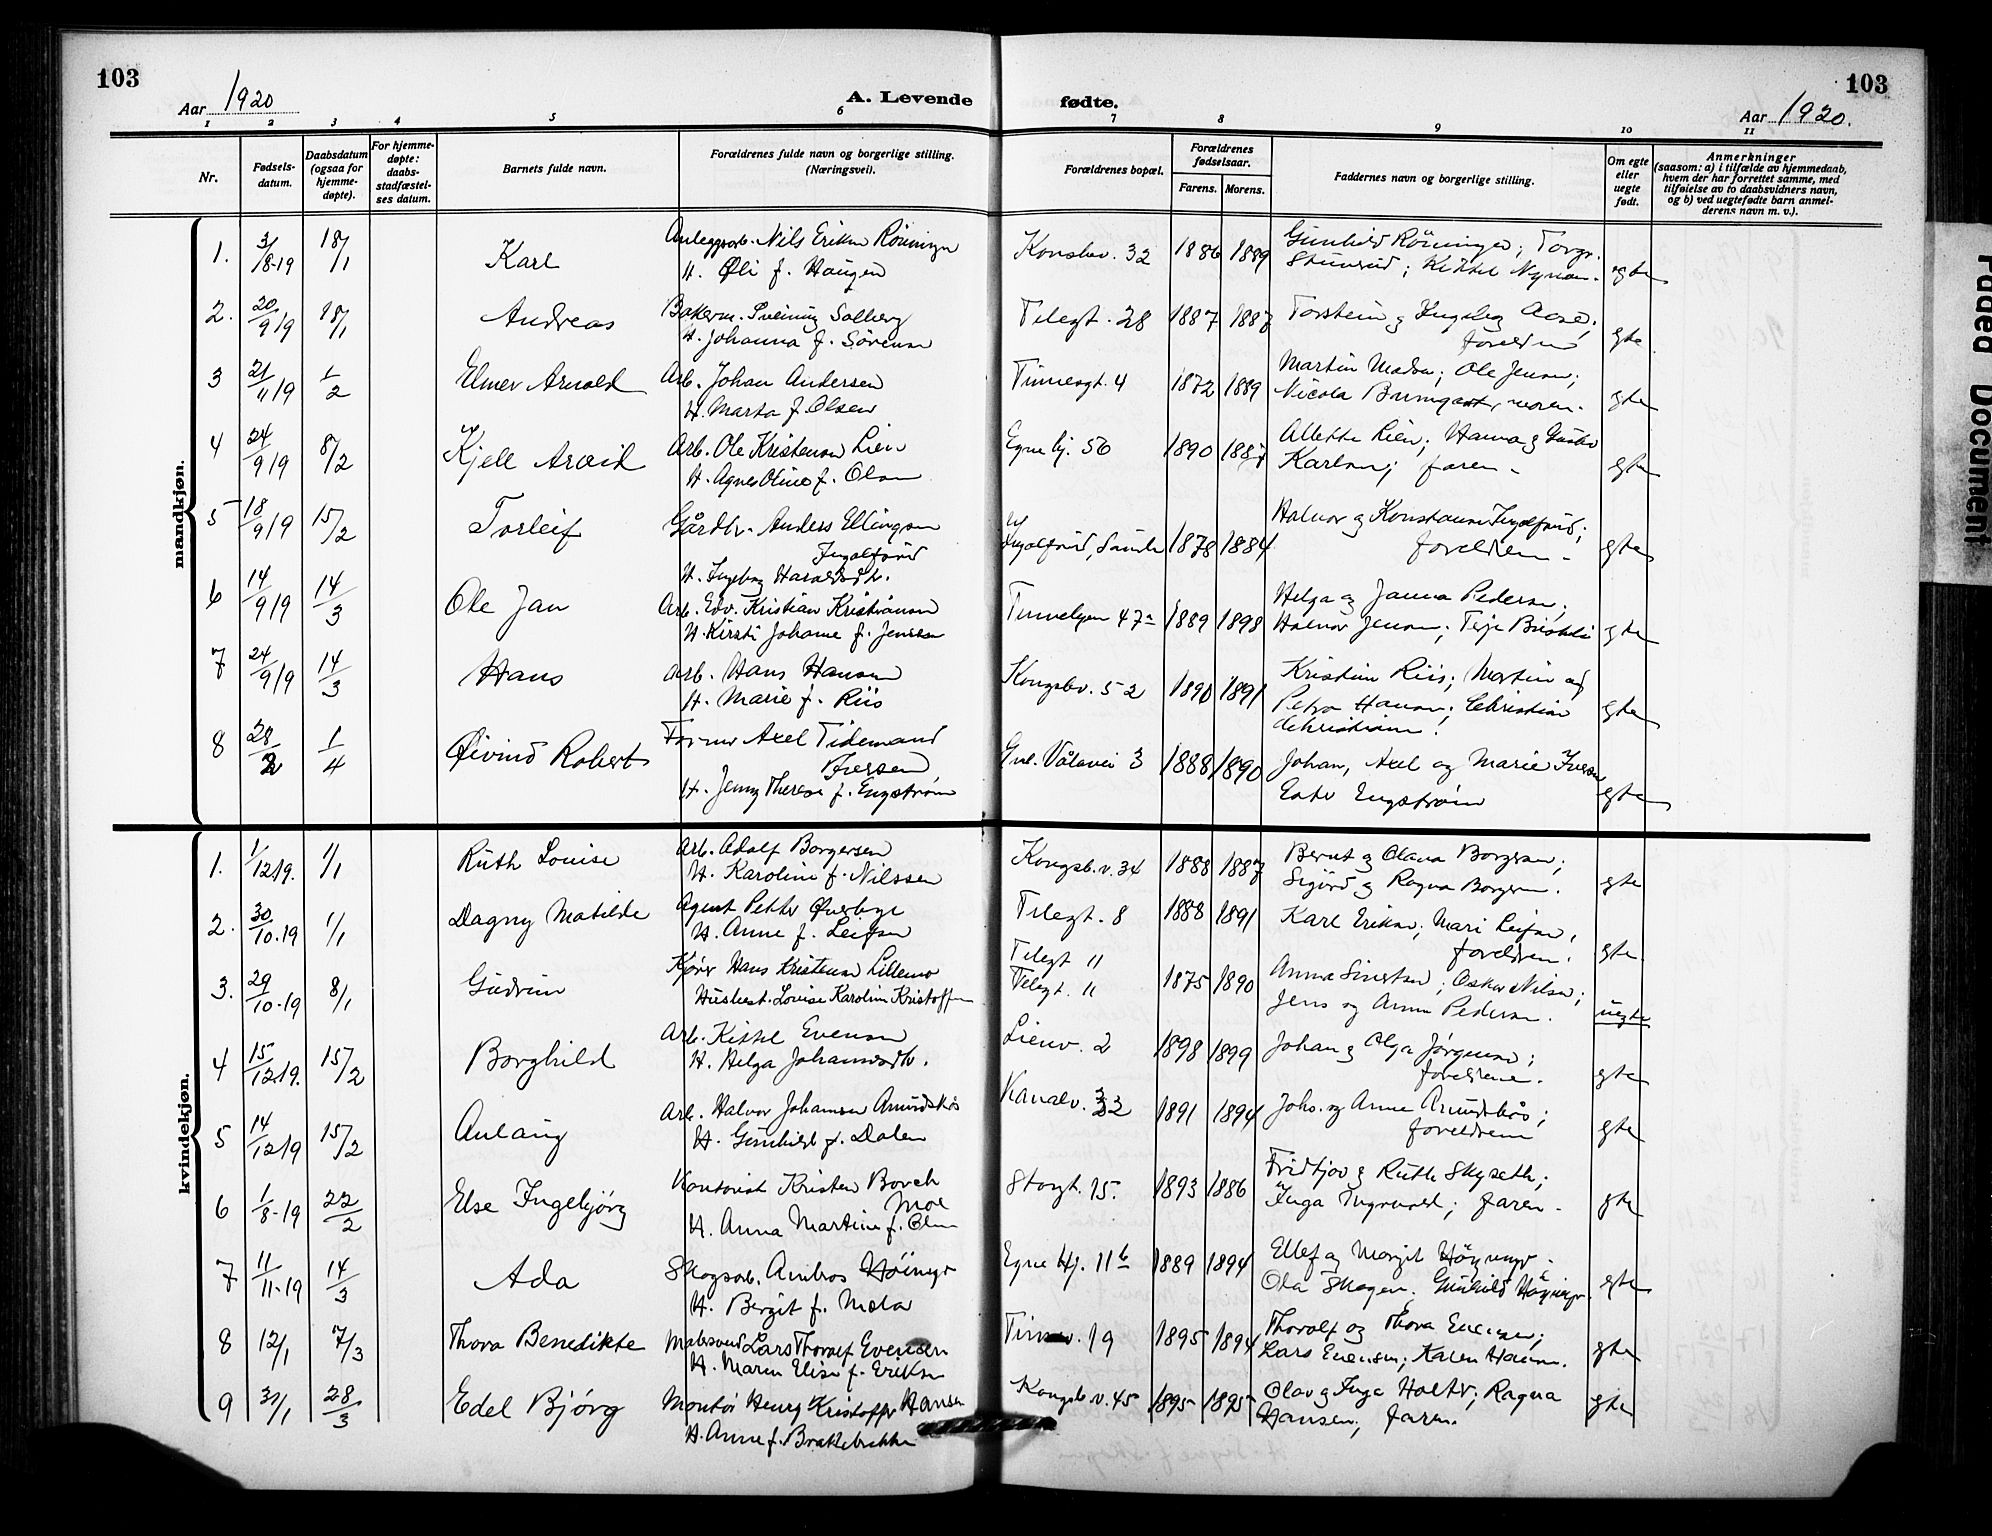 SAKO, Notodden kirkebøker, G/Ga/L0001: Klokkerbok nr. 1, 1912-1923, s. 103